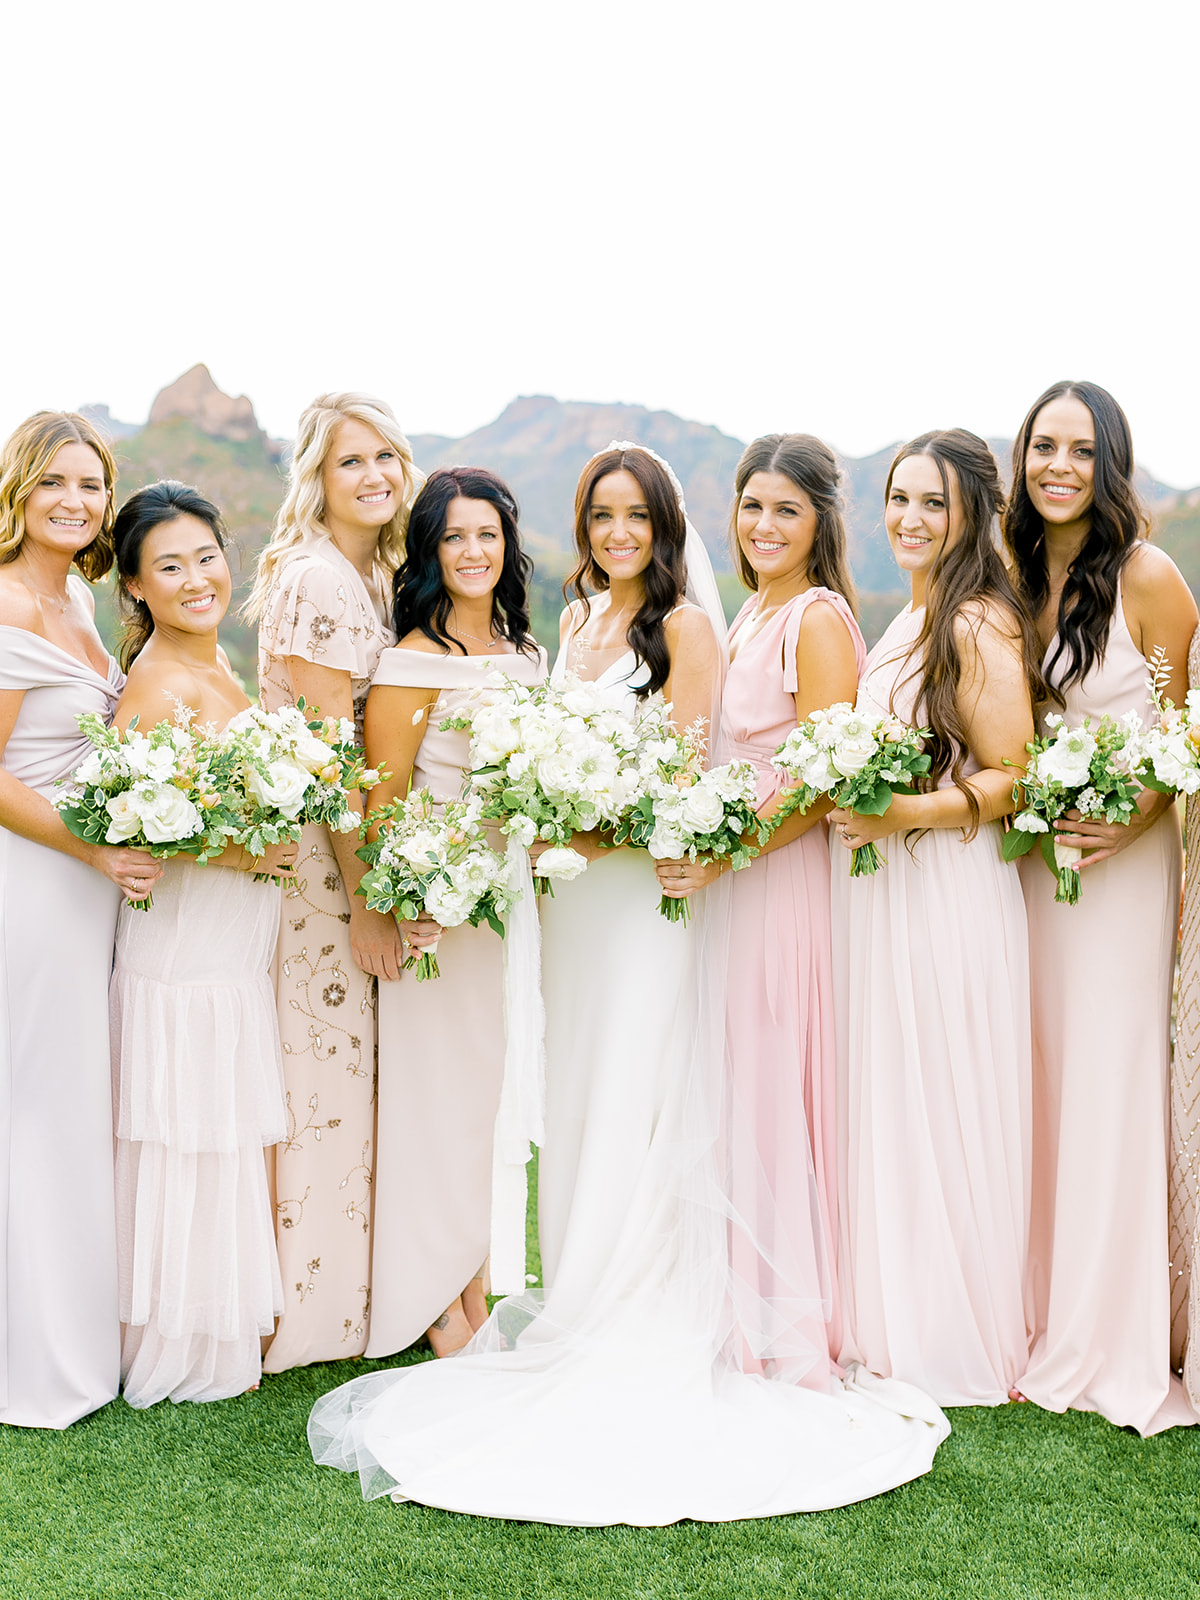 Ben & Emma's Wedding - Natalie Schutt Photography - Bridal Party-98.jpg